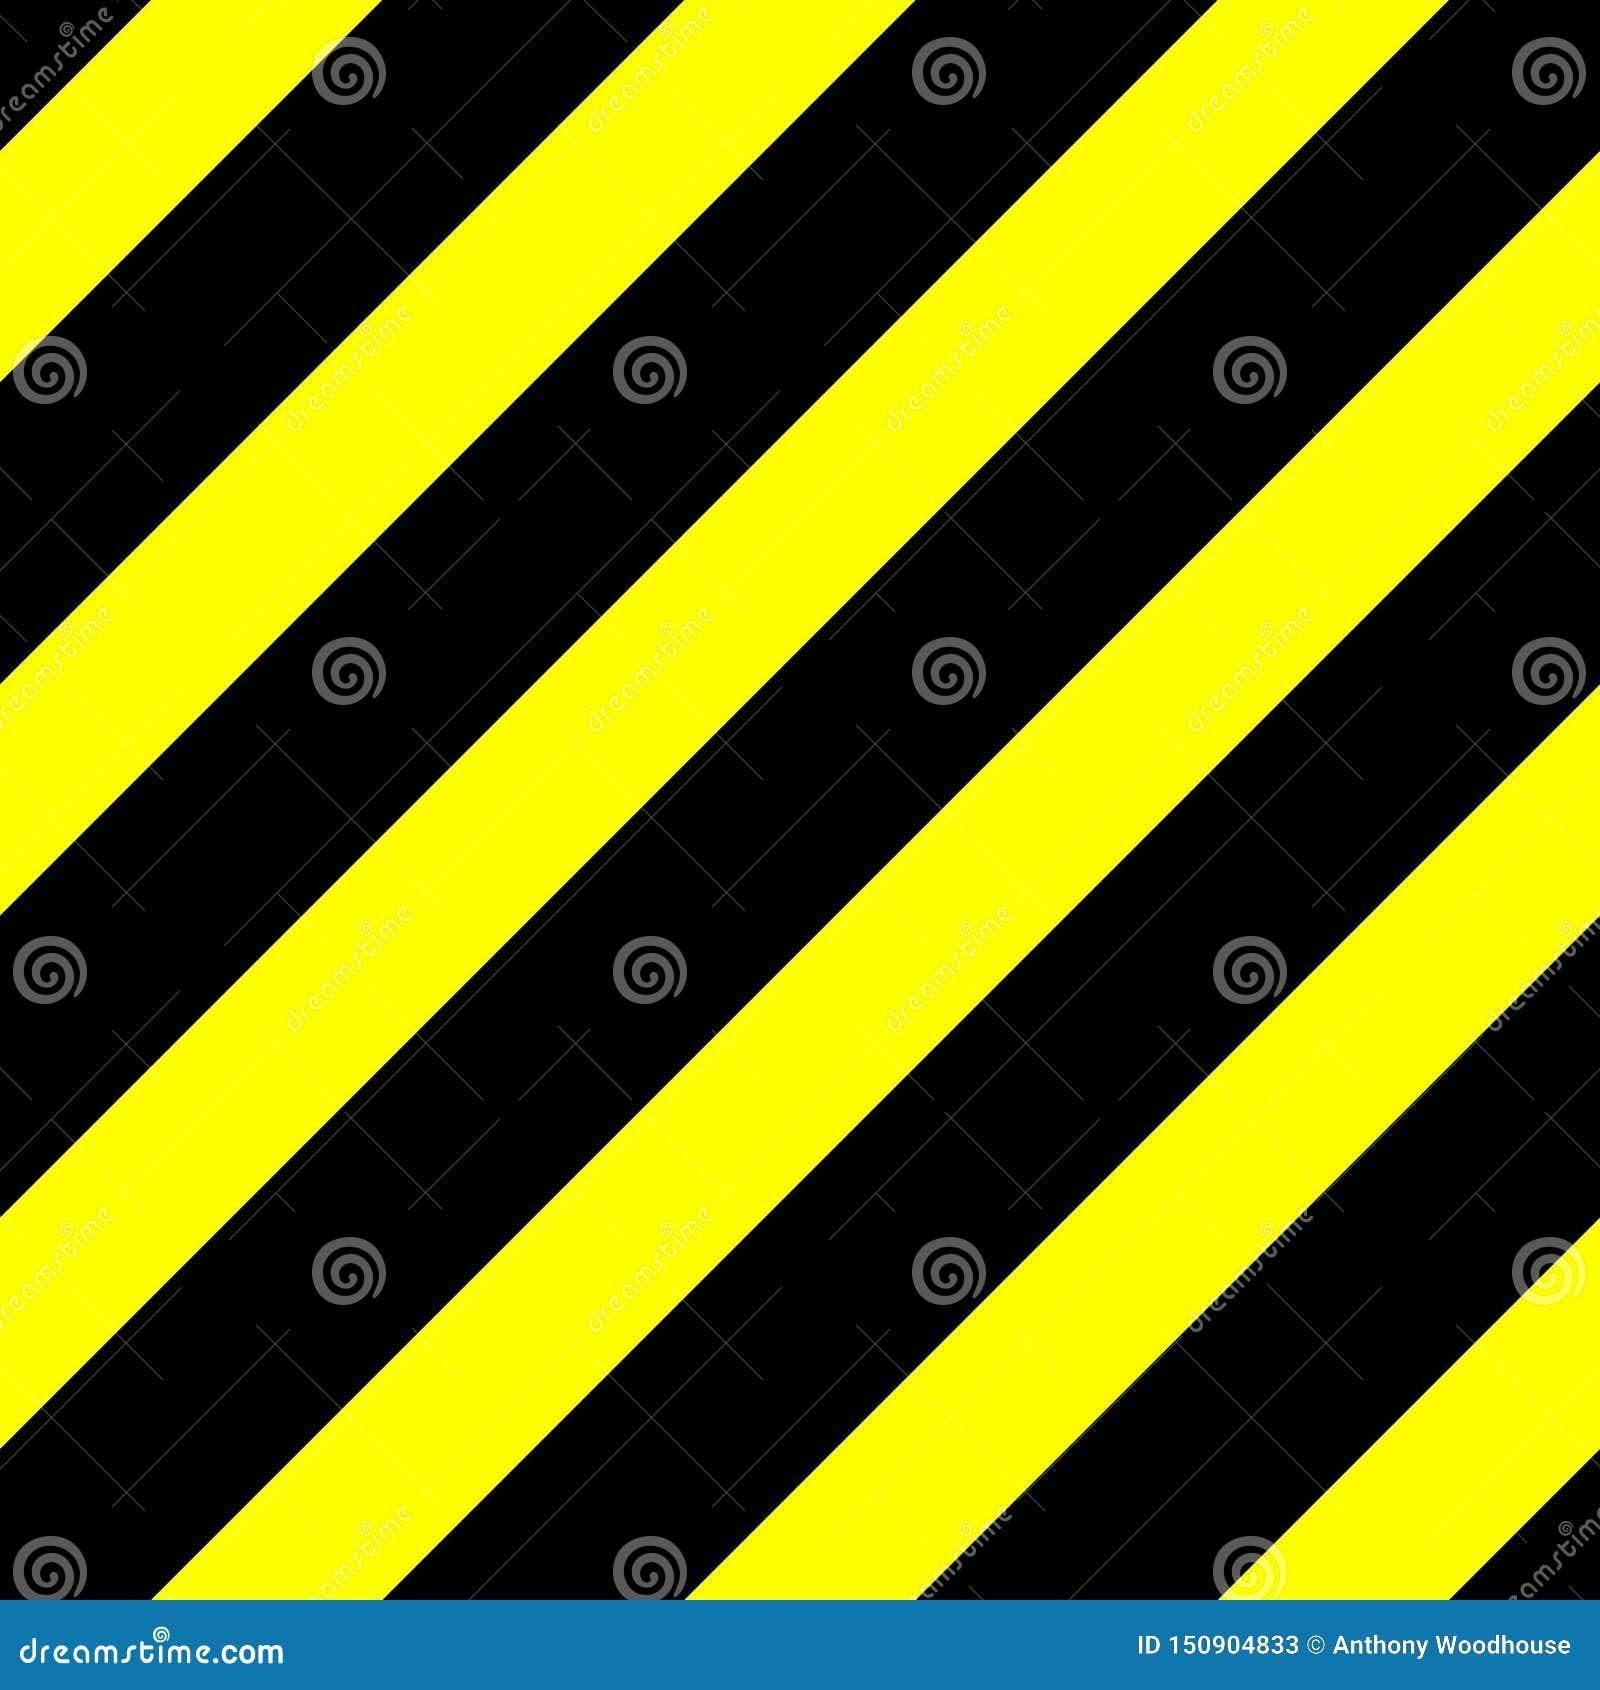 Gráfico de vector inconsútil de líneas diagonales negras en un fondo amarillo Esto significa peligro o un peligro